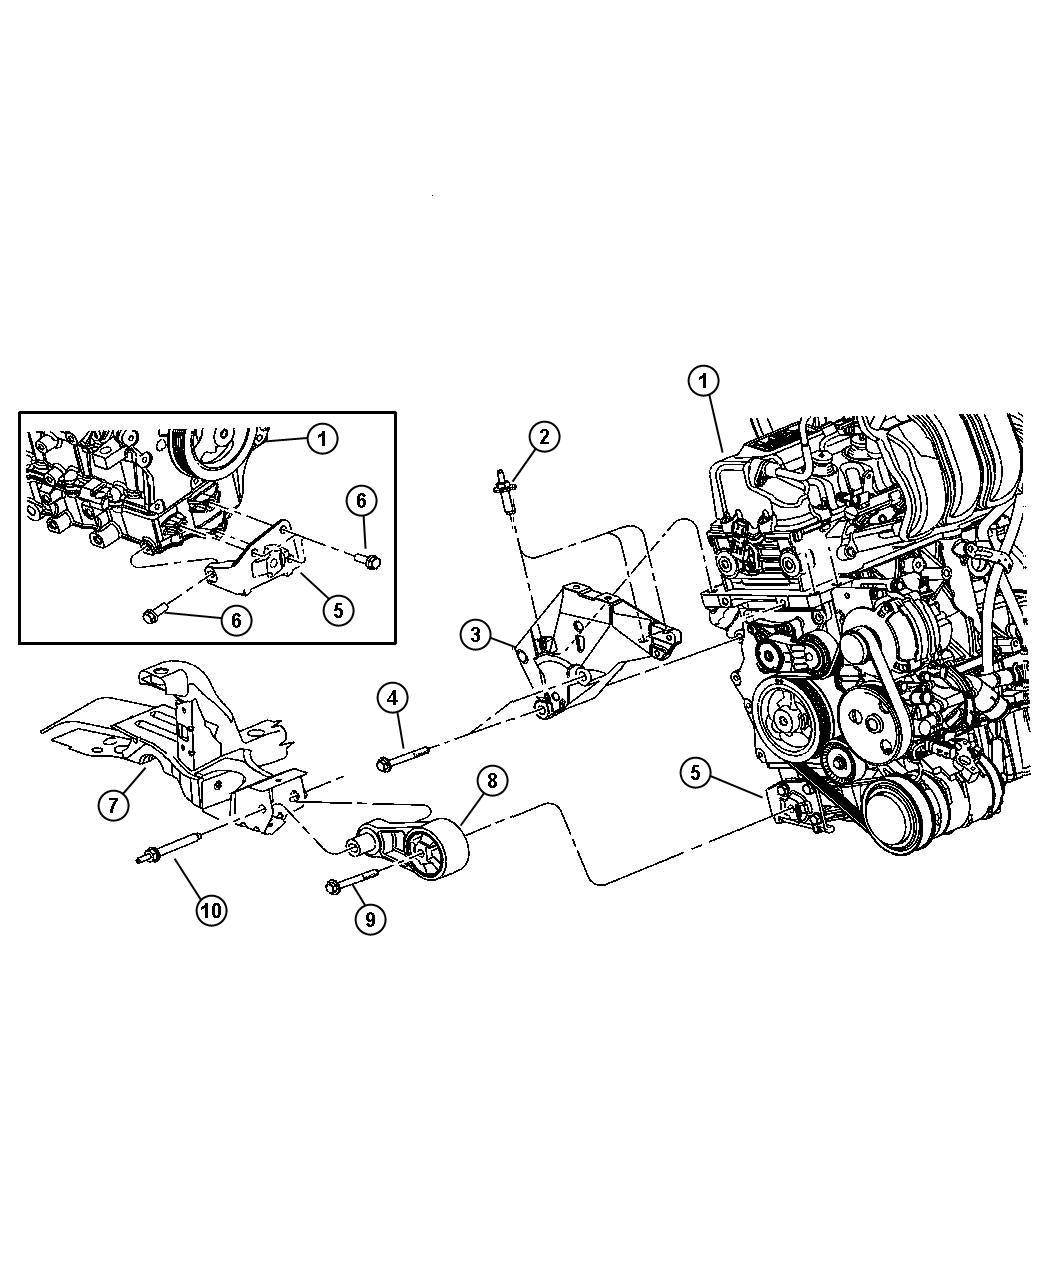 Dodge Neon Isolator. Transmission mount. Manual